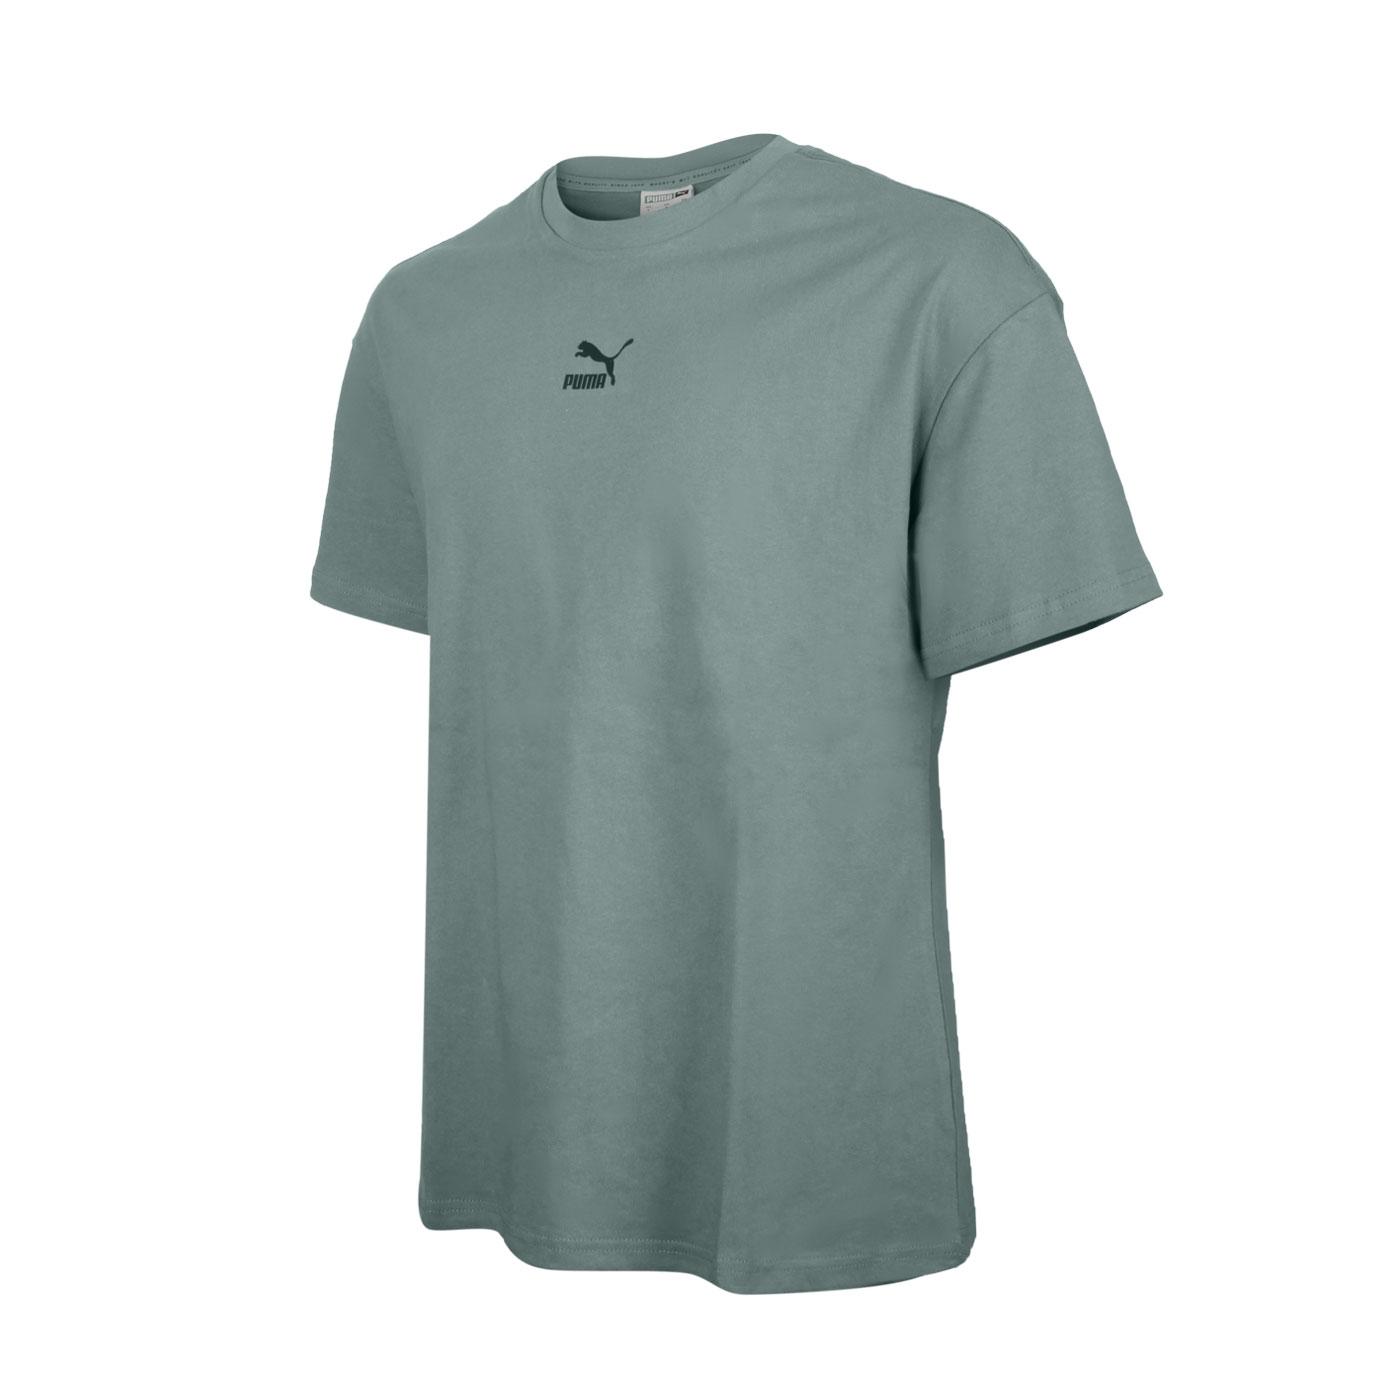 PUMA 男款流行系列Classics寬鬆短袖T恤 53213568 - 綠黑